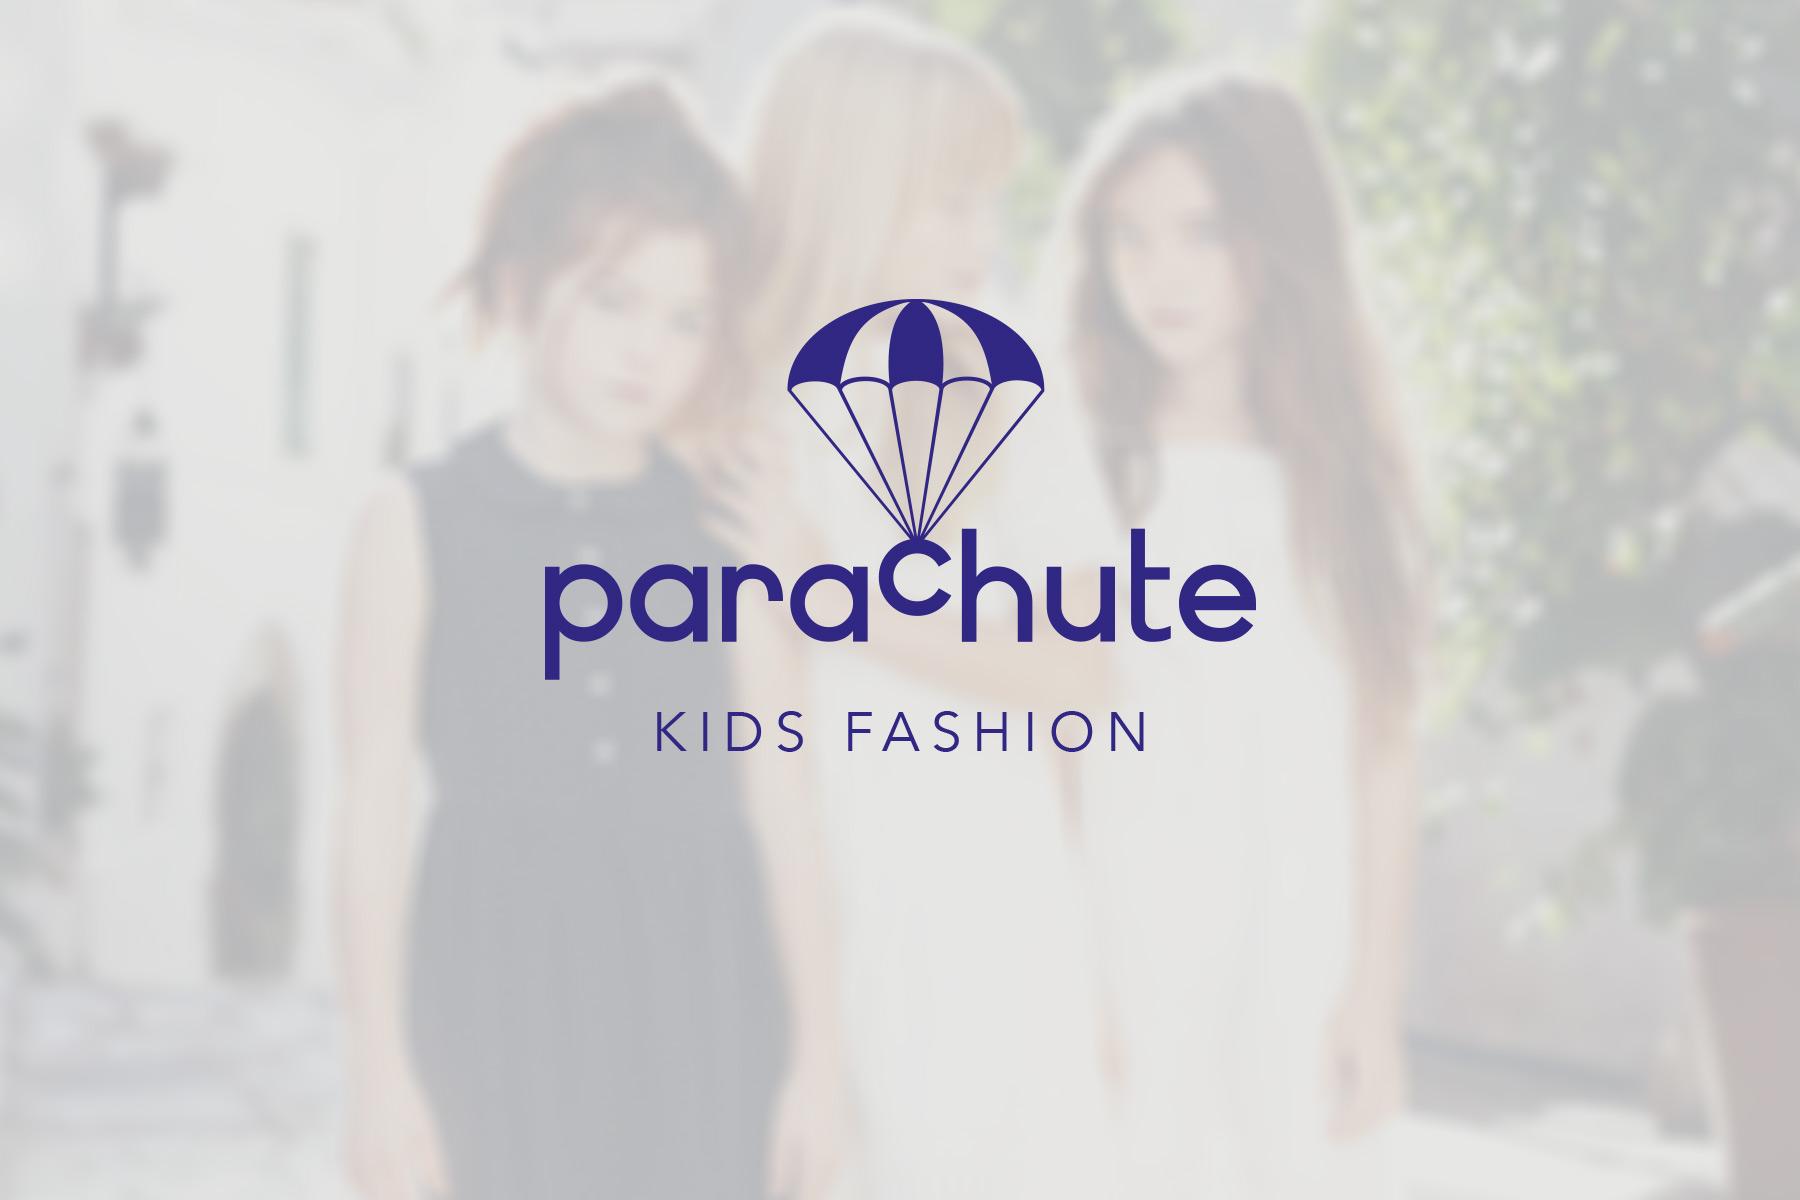 logo_parachute_kids_fashion